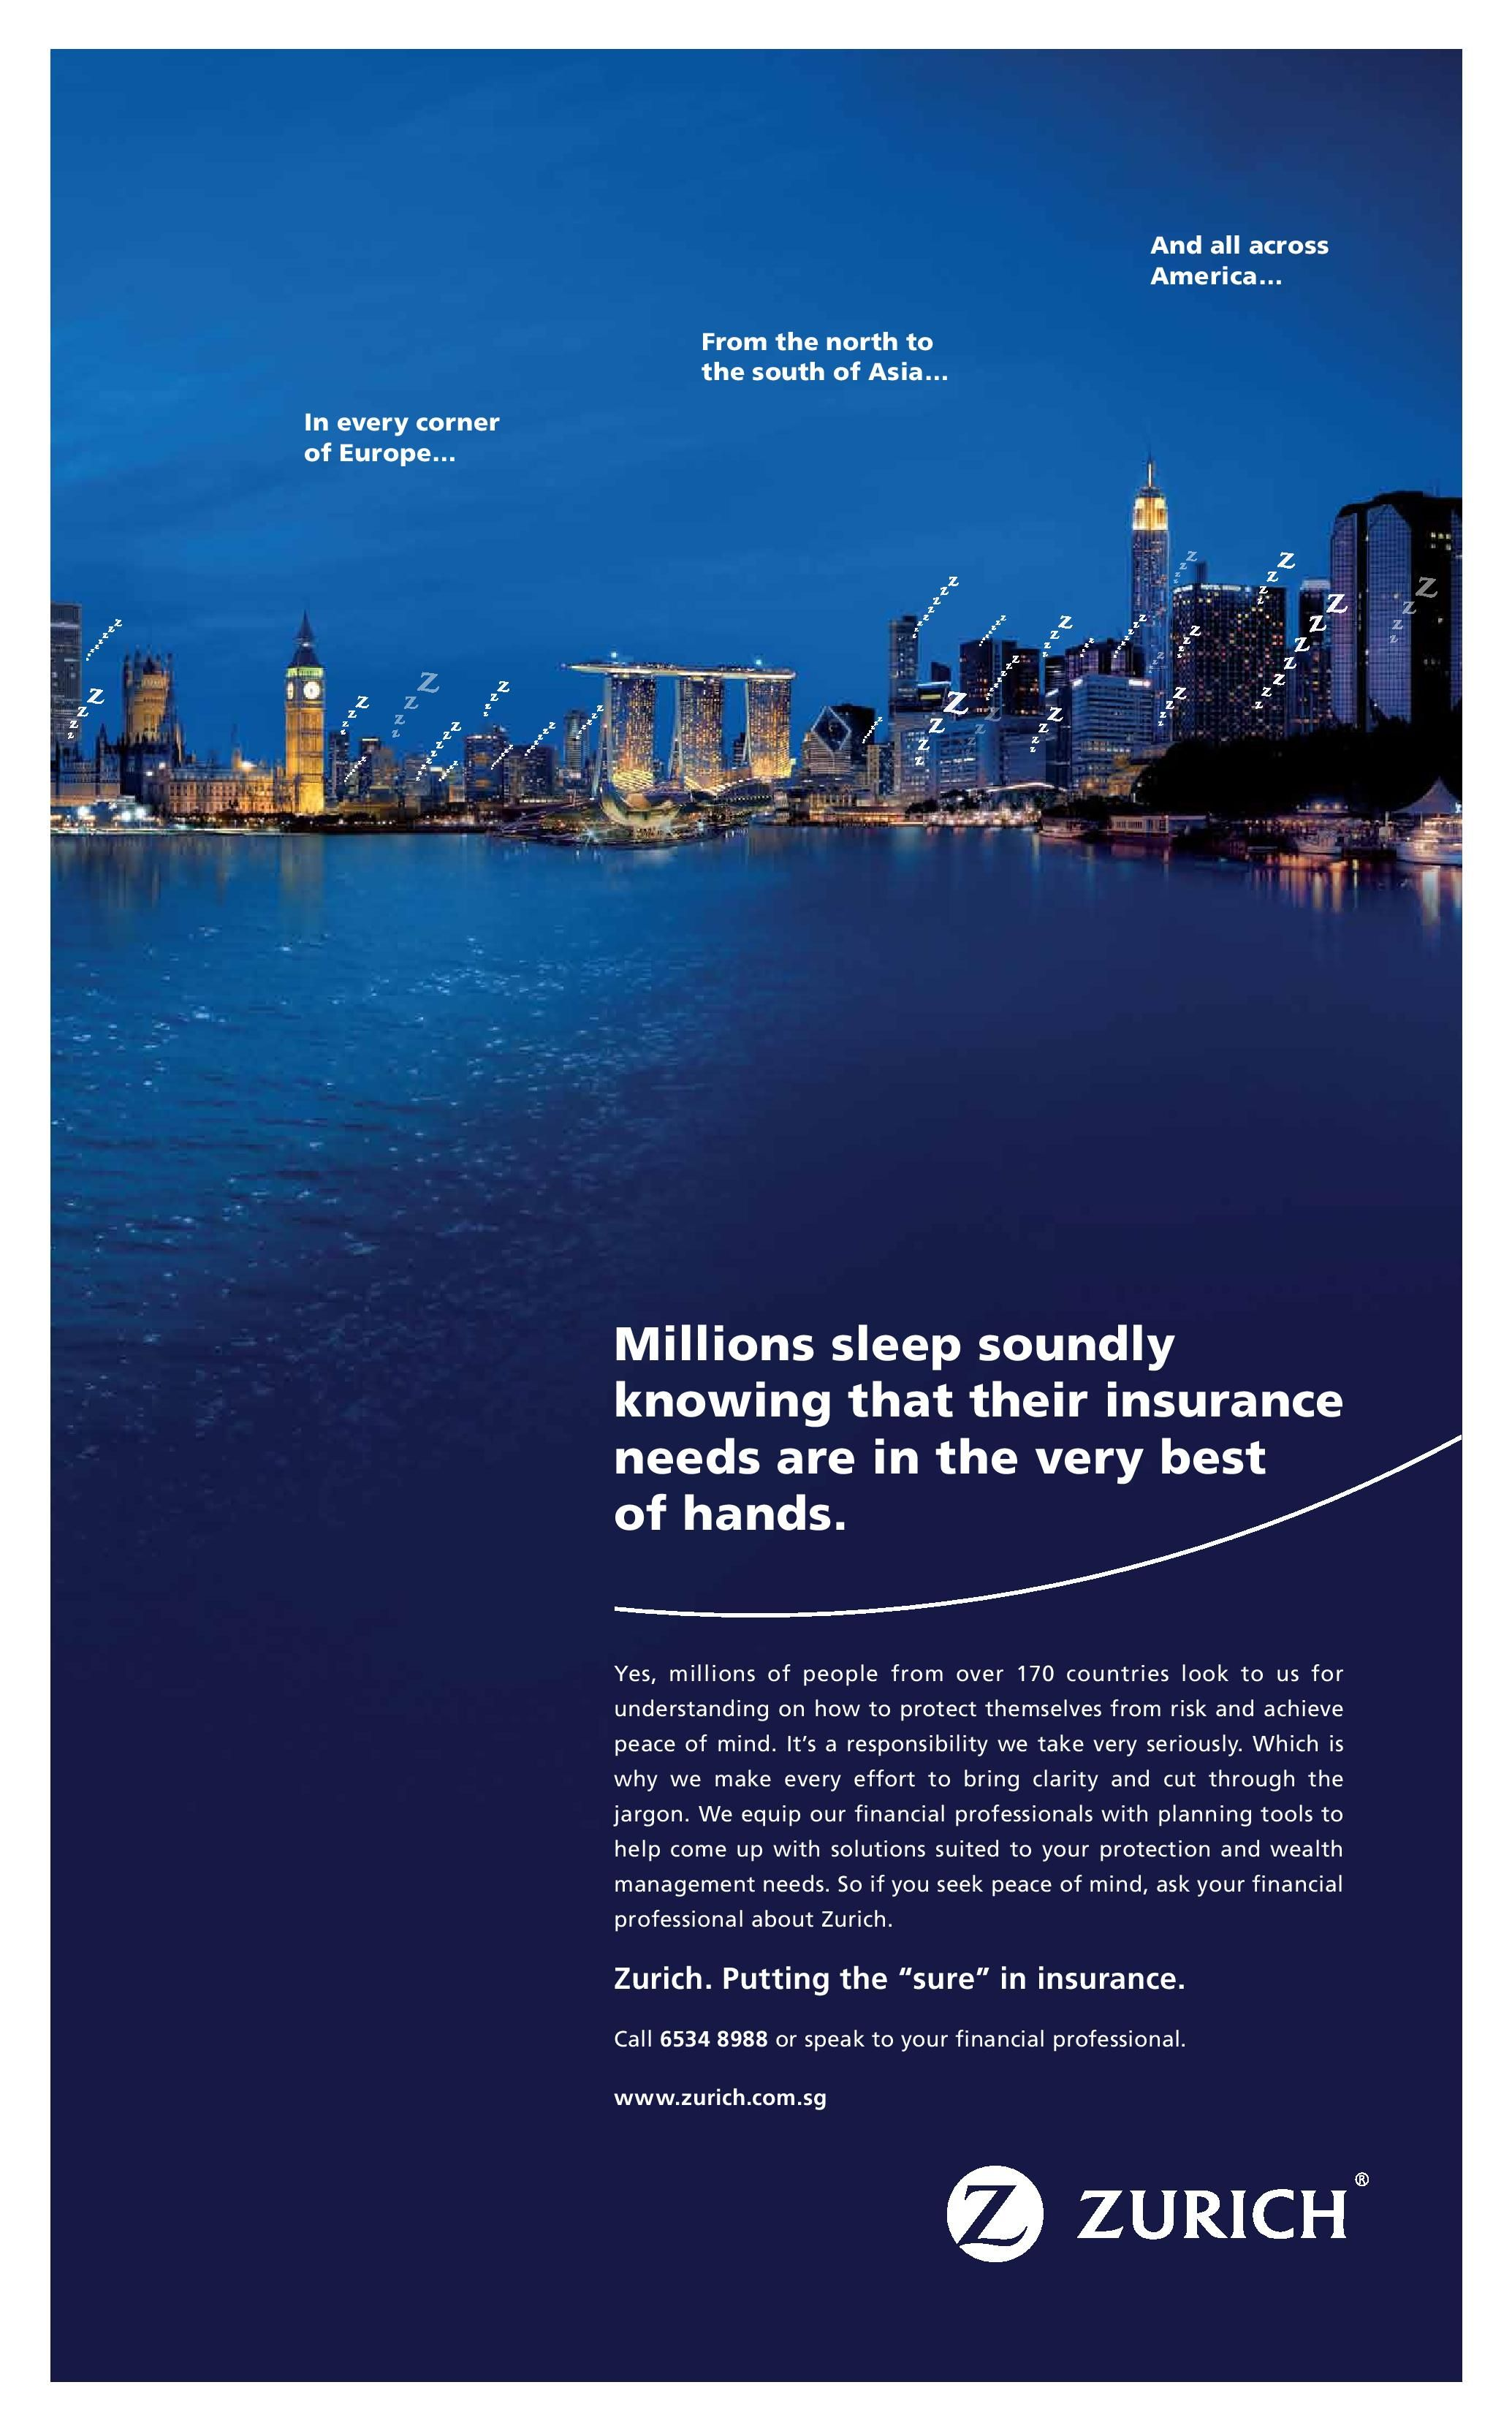 Pin By Zurich Insurance Singapore On Seen Heard America Europe No Response